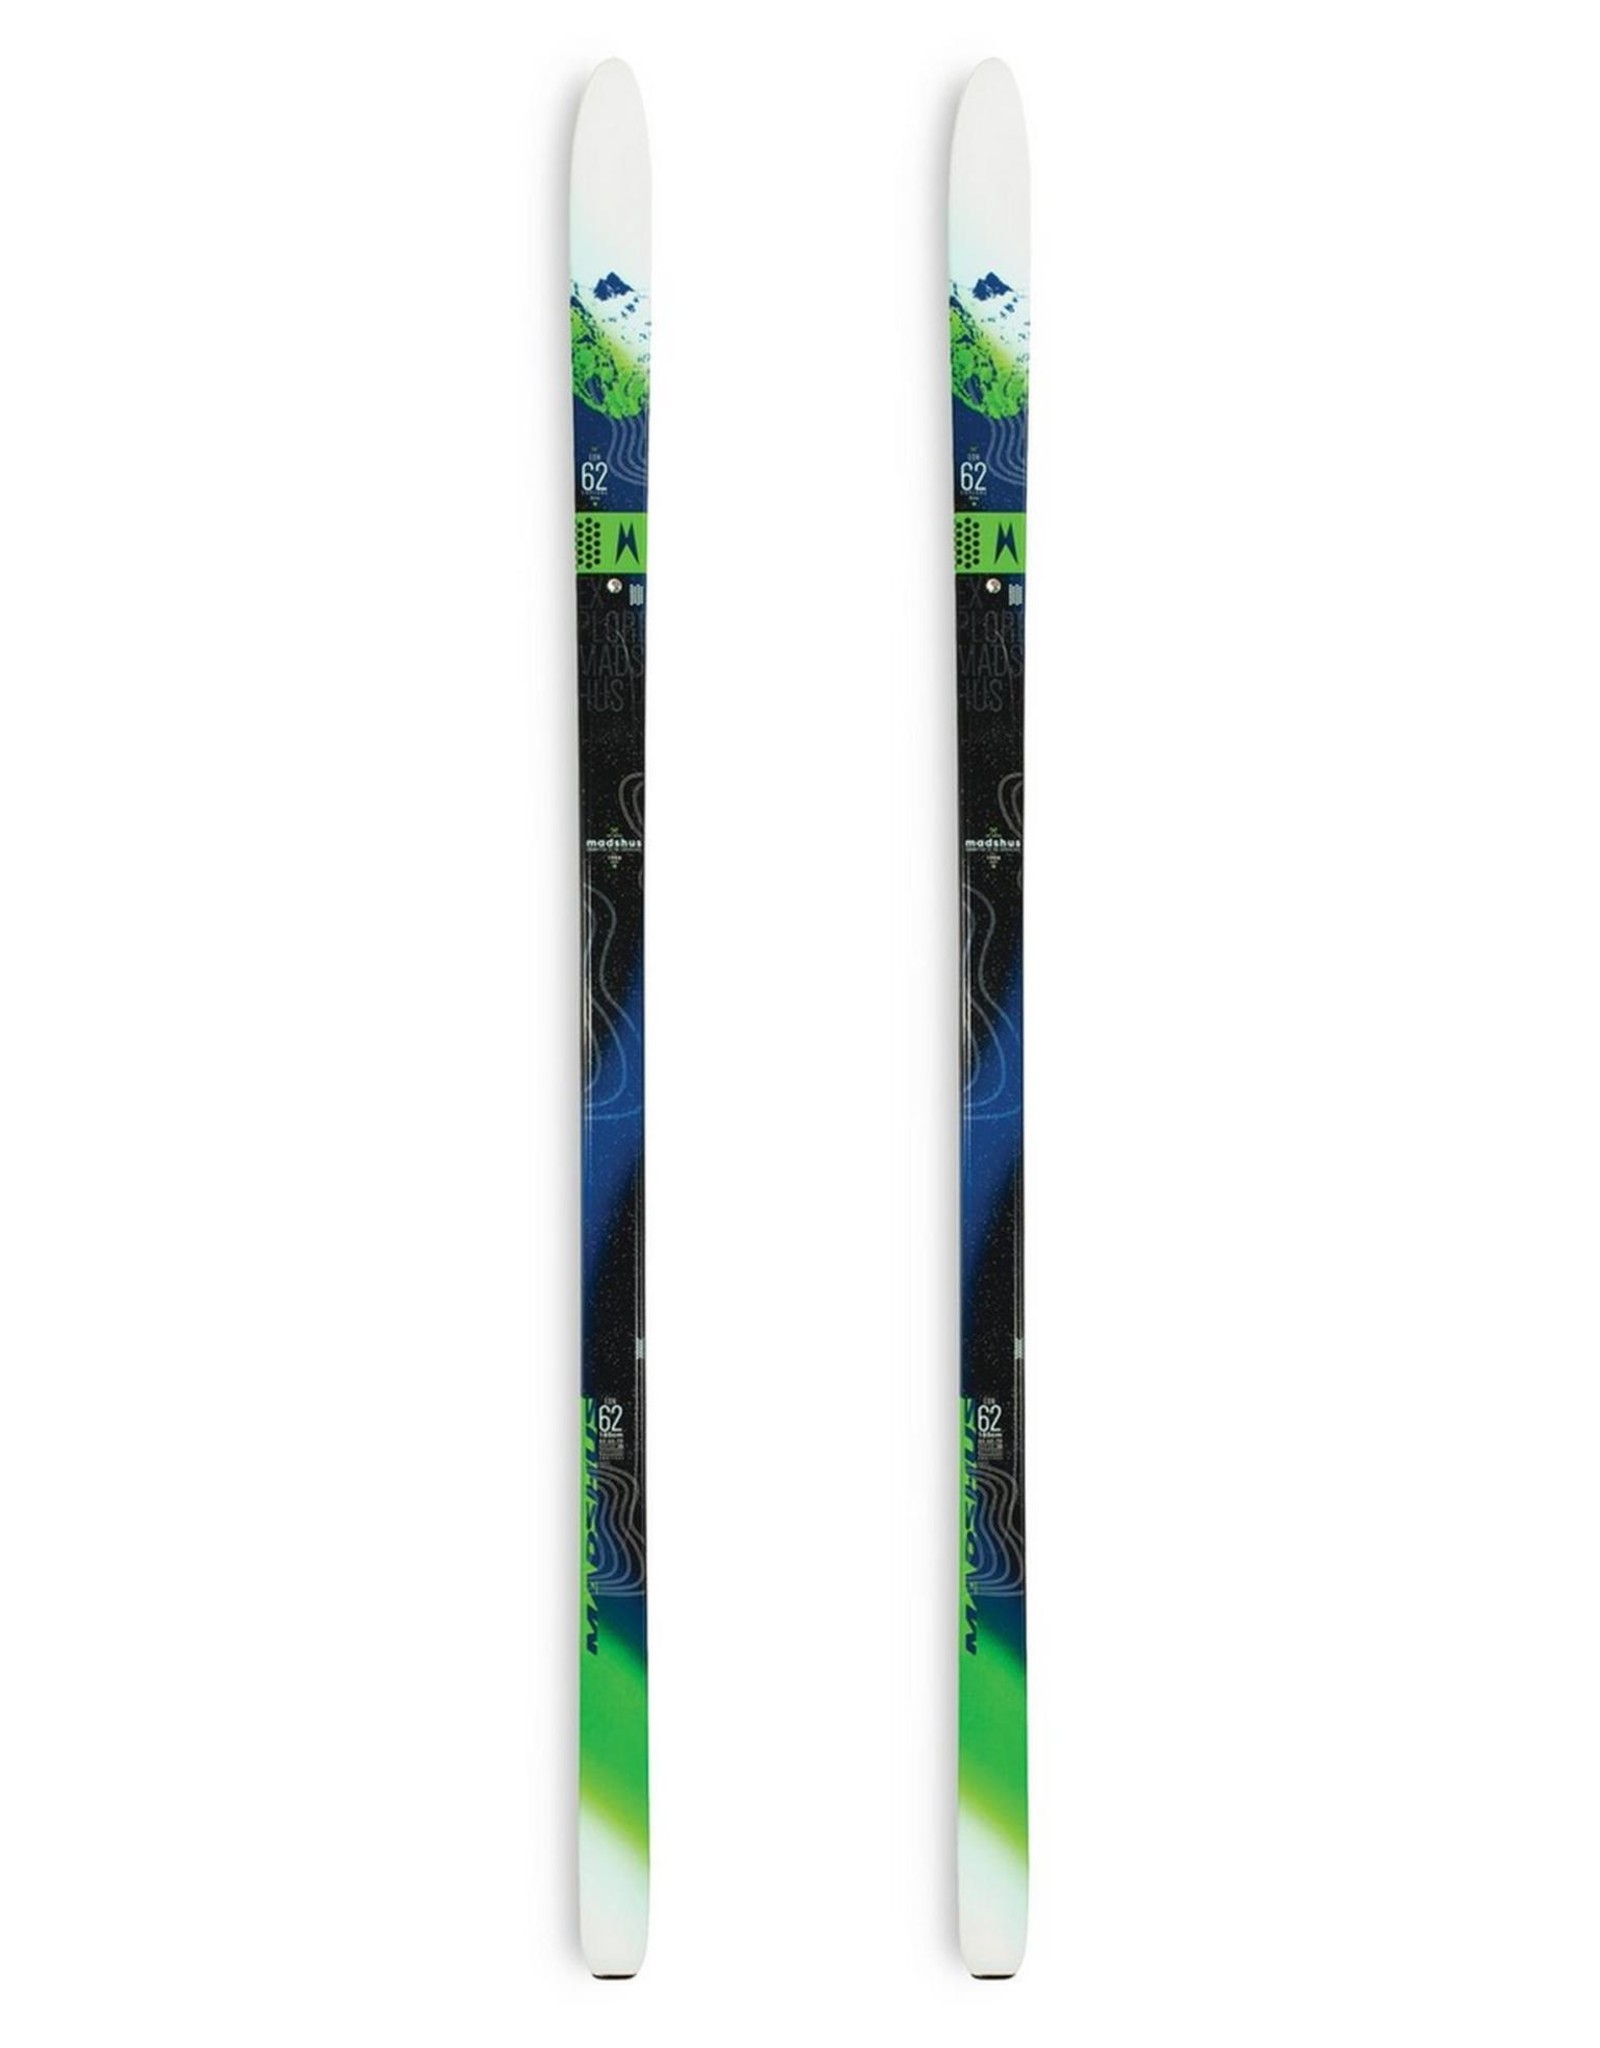 Madshus 2021 Eon 62 XCD Waxless Skis